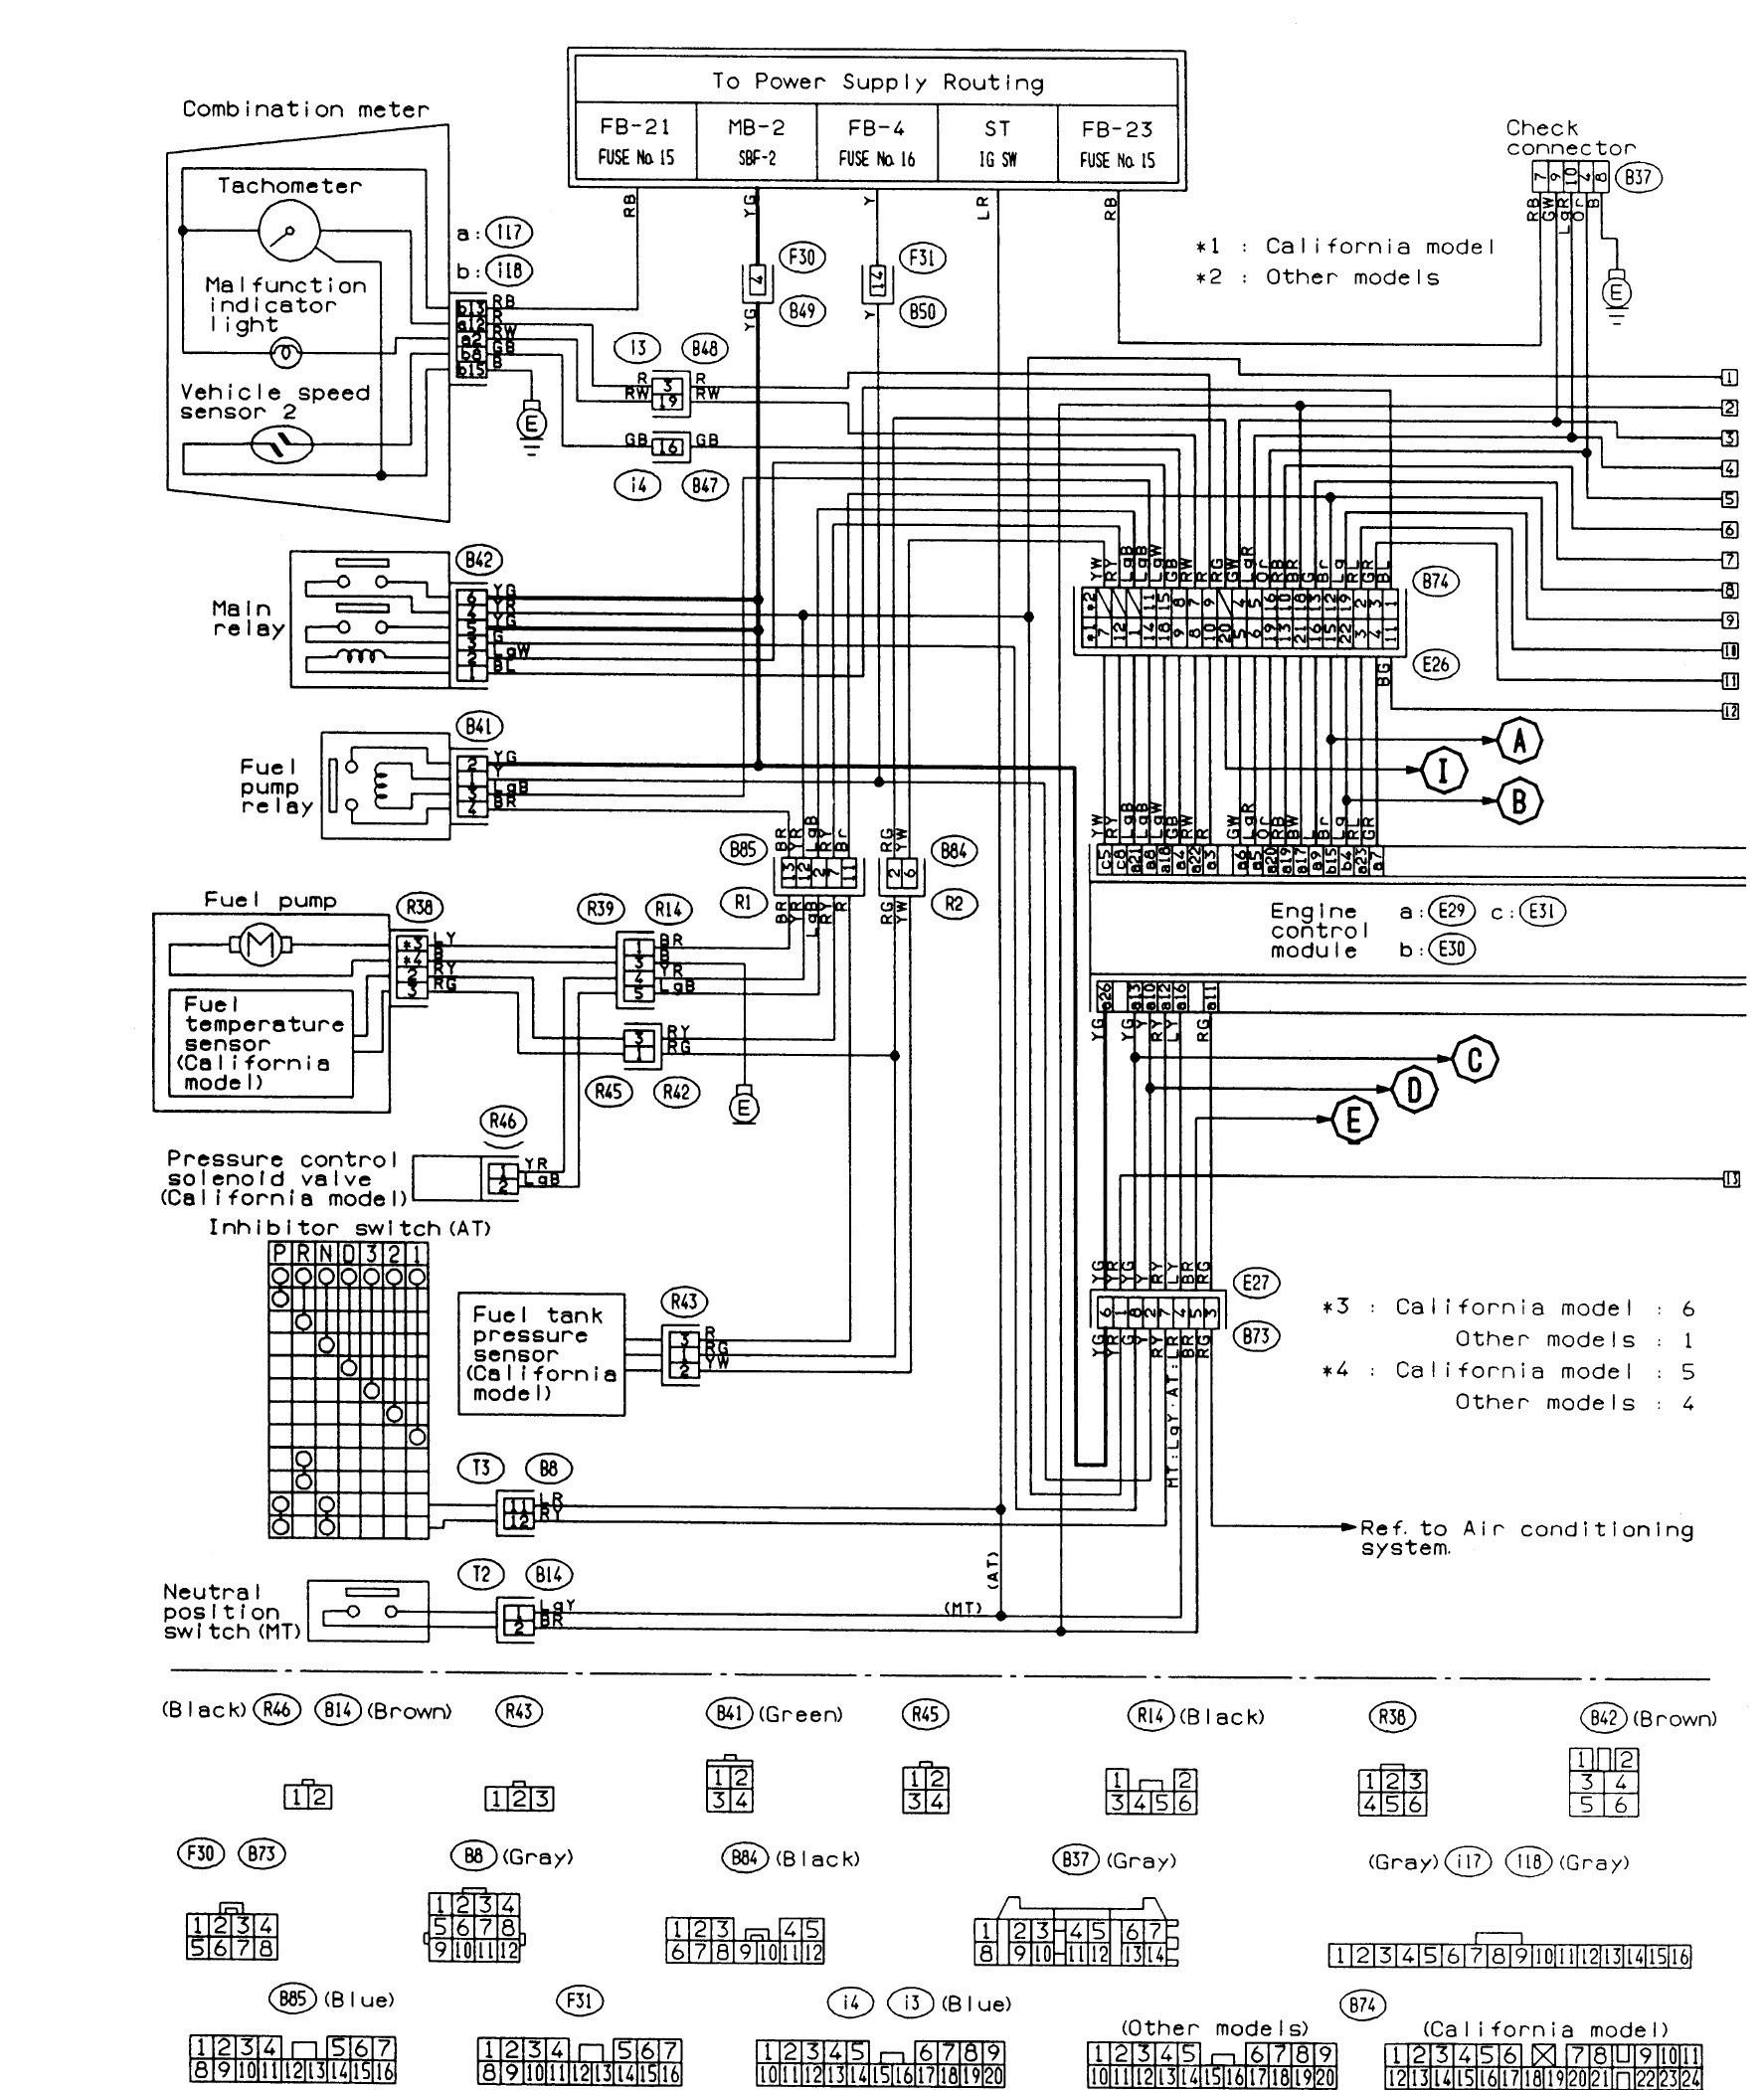 2009 subaru forester radio wiring diagram 4 way trailer 2002 engine my